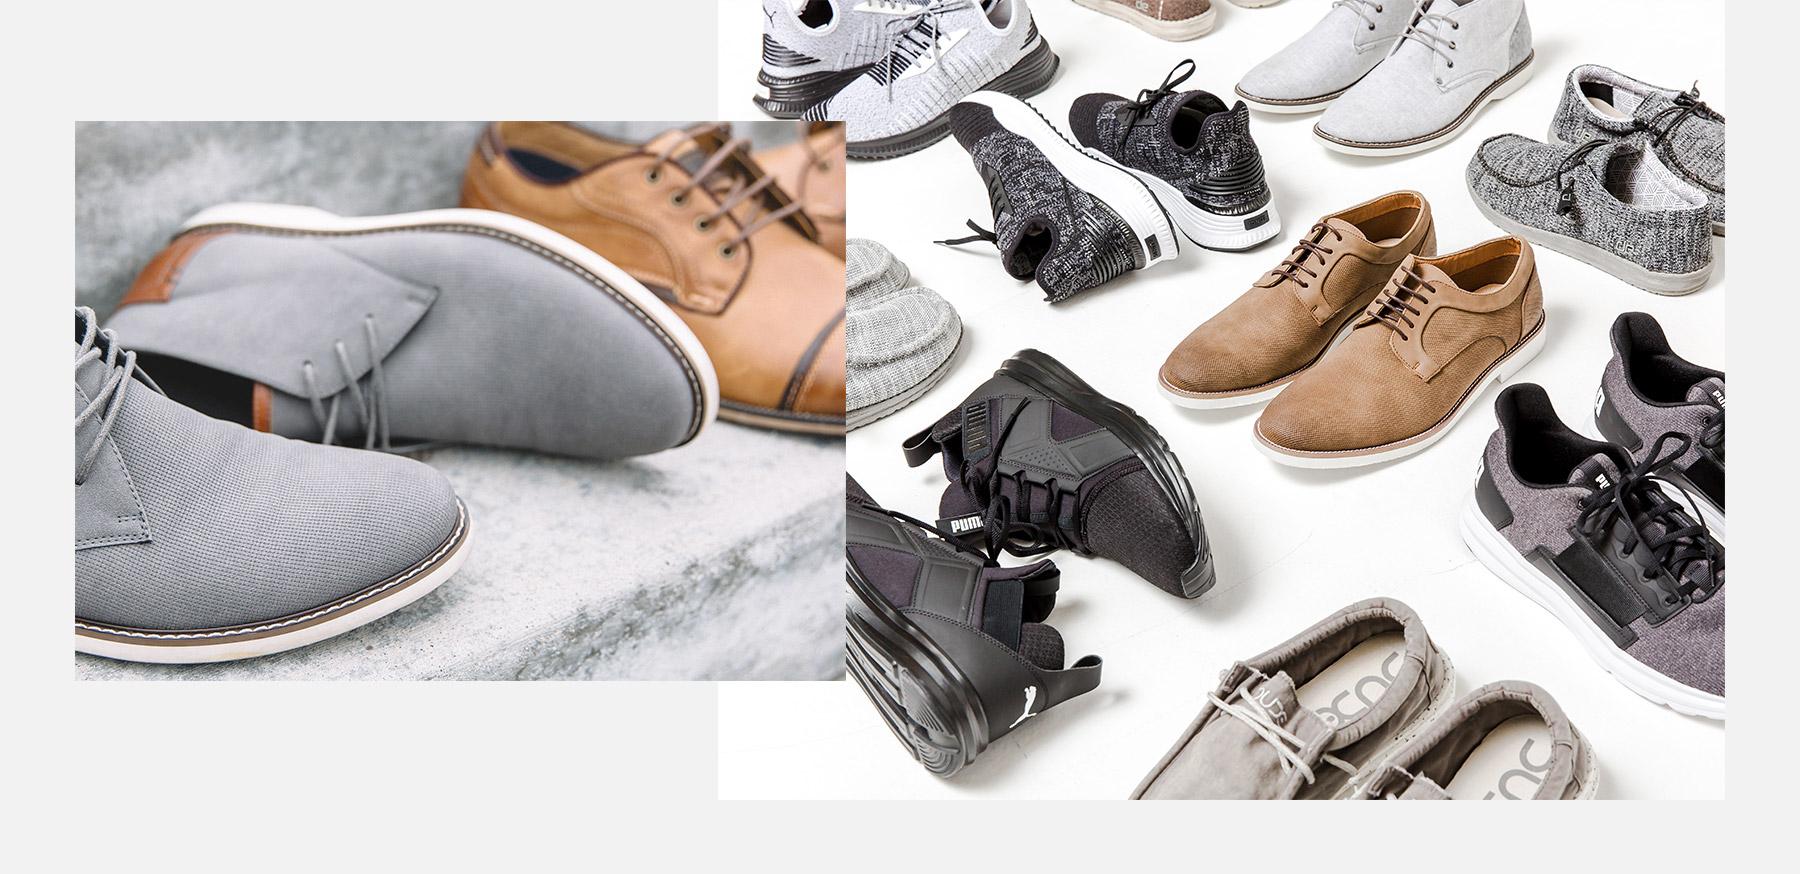 Nine pairs of men's shoes